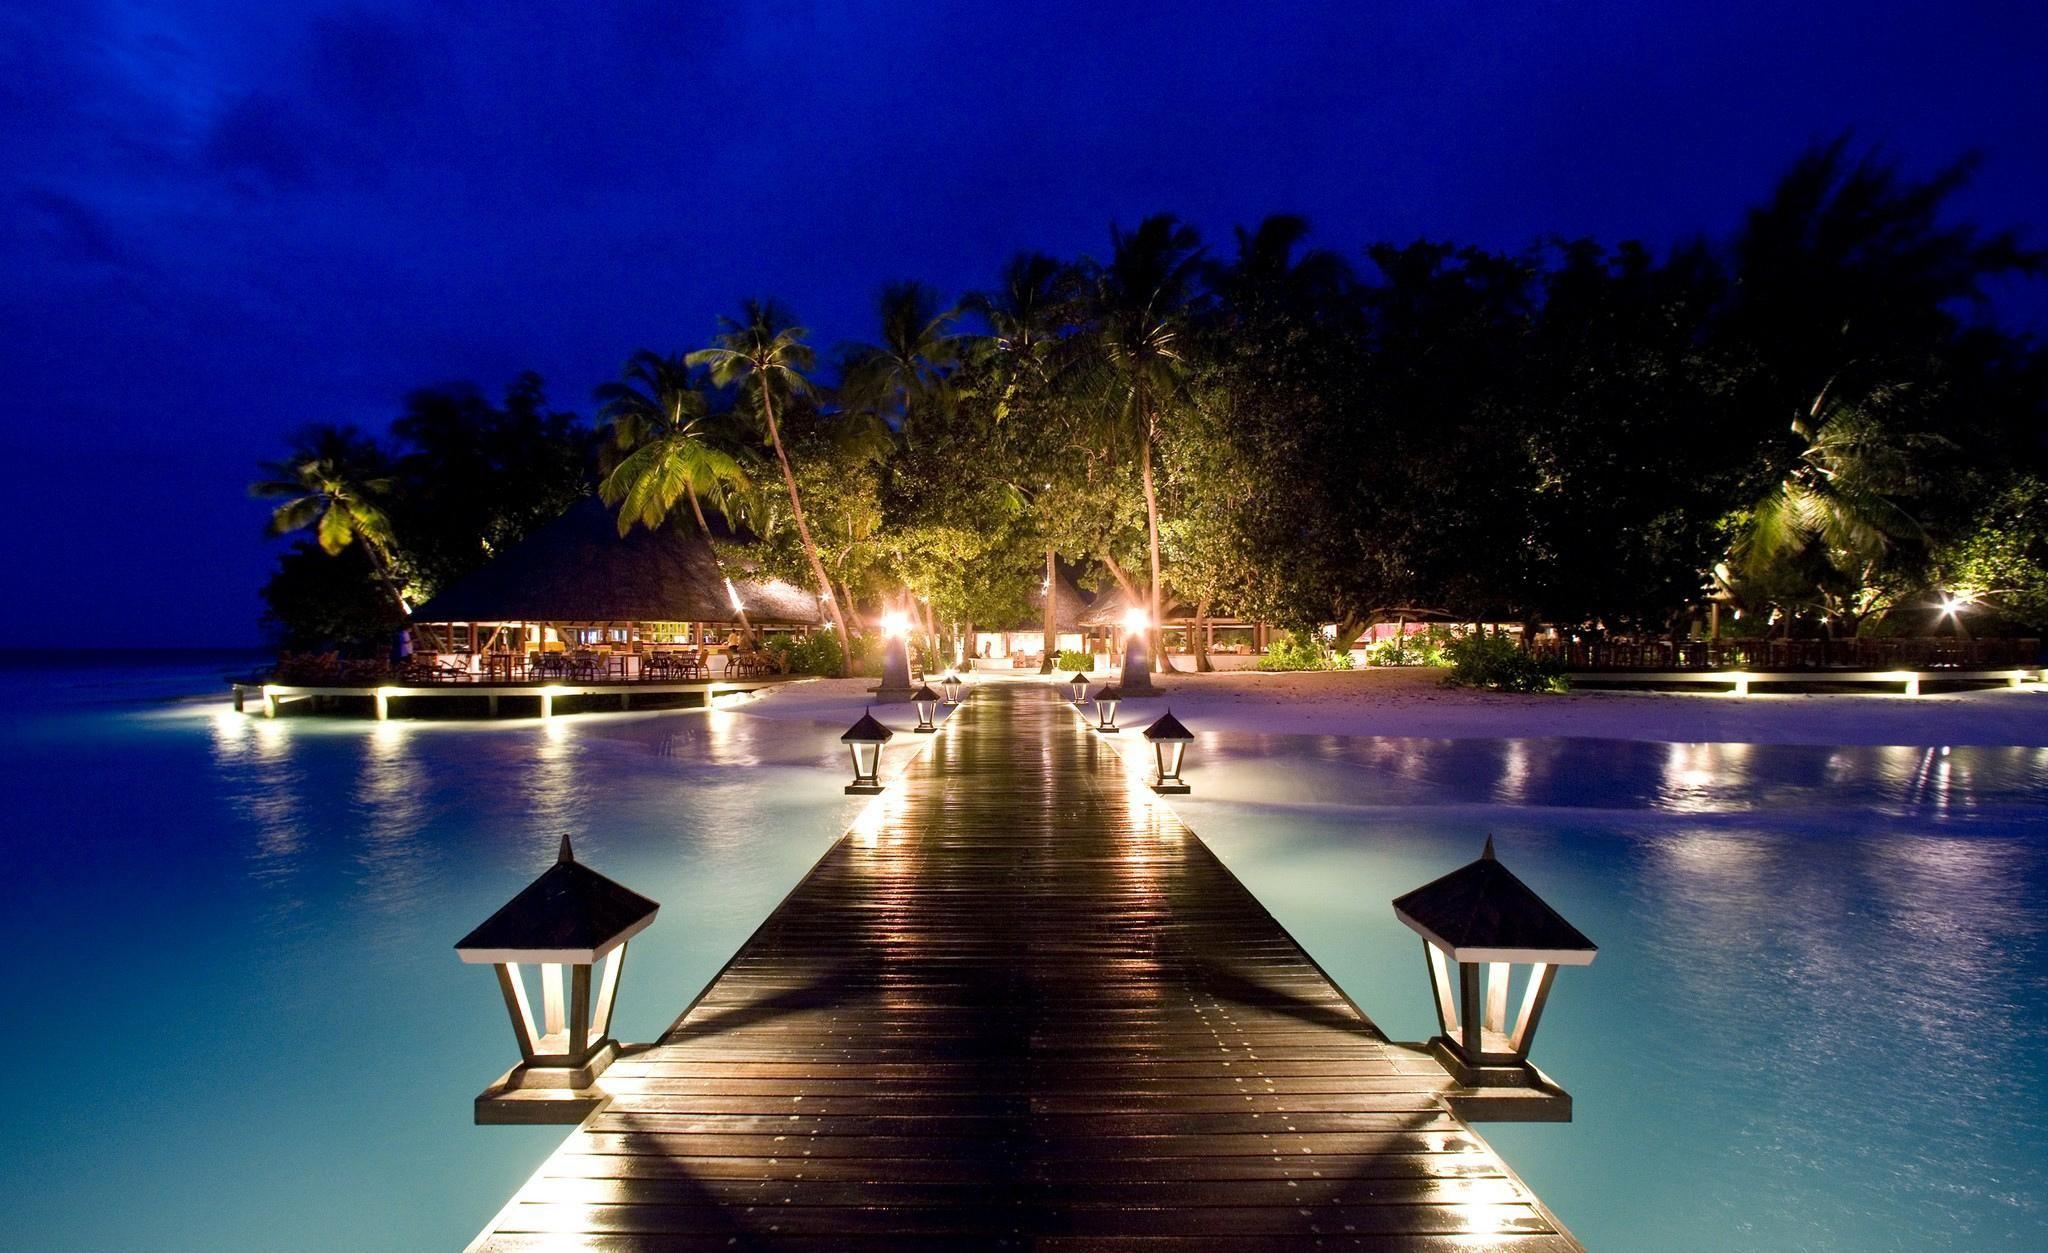 Night Beach Wallpaper Free Ma2 Beach At Night Maldives